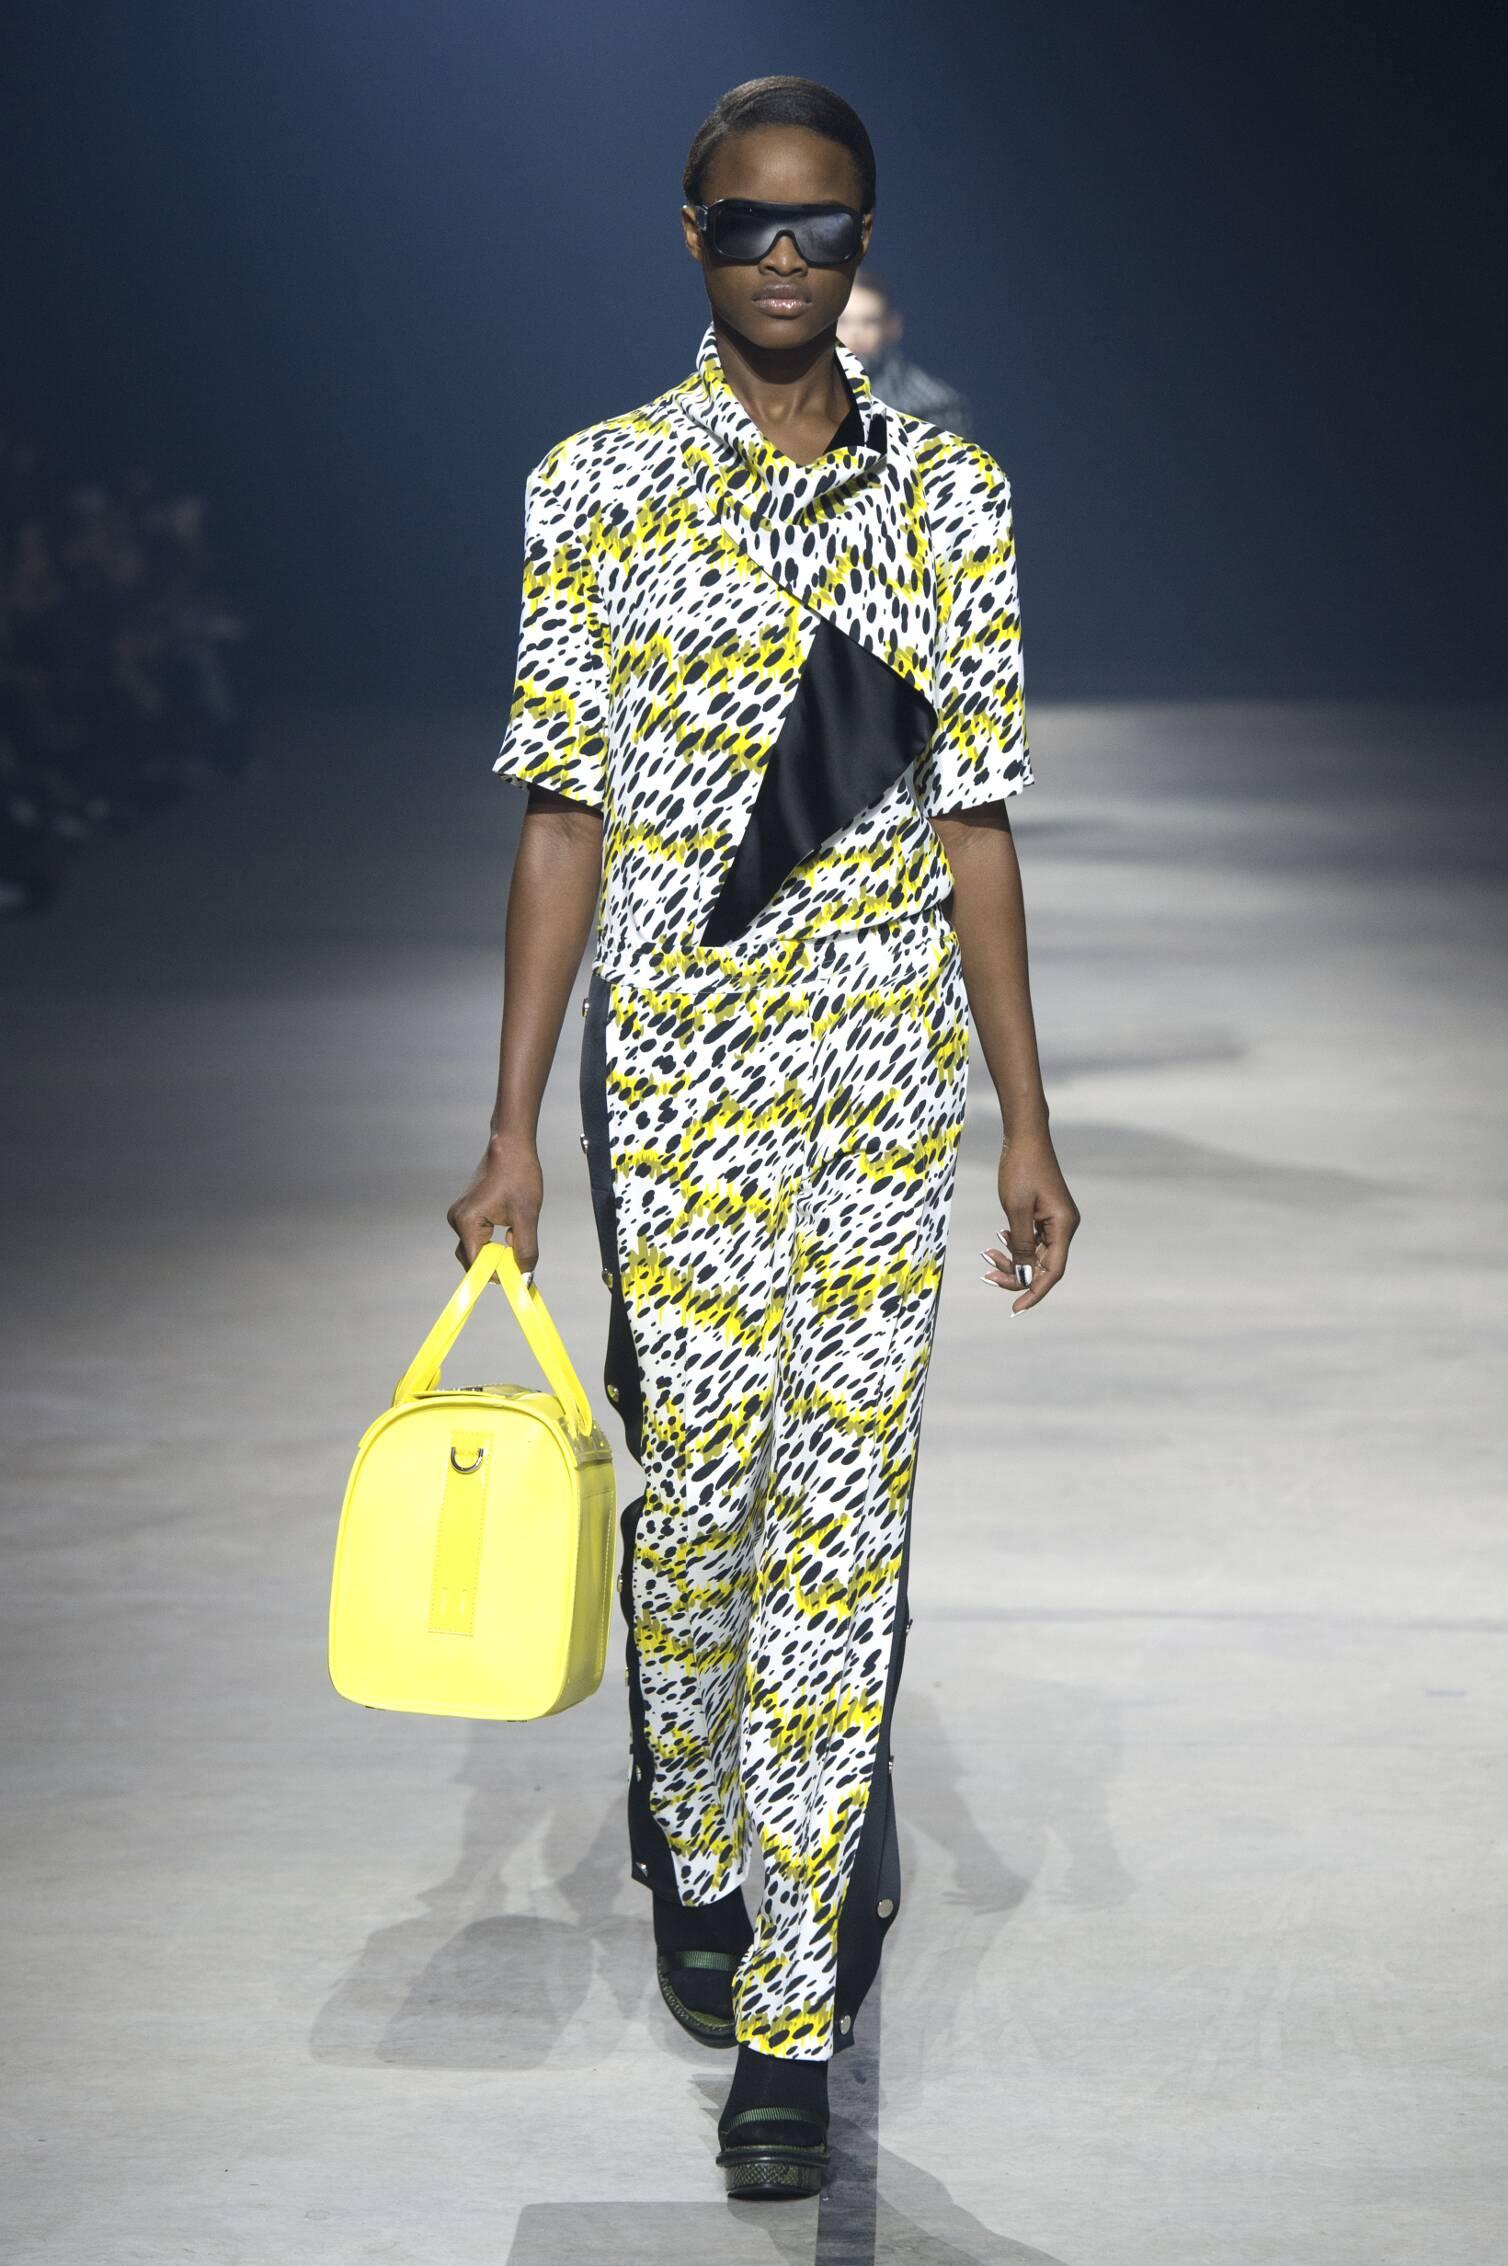 Fashion Women Models Kenzo Collection Catwalk